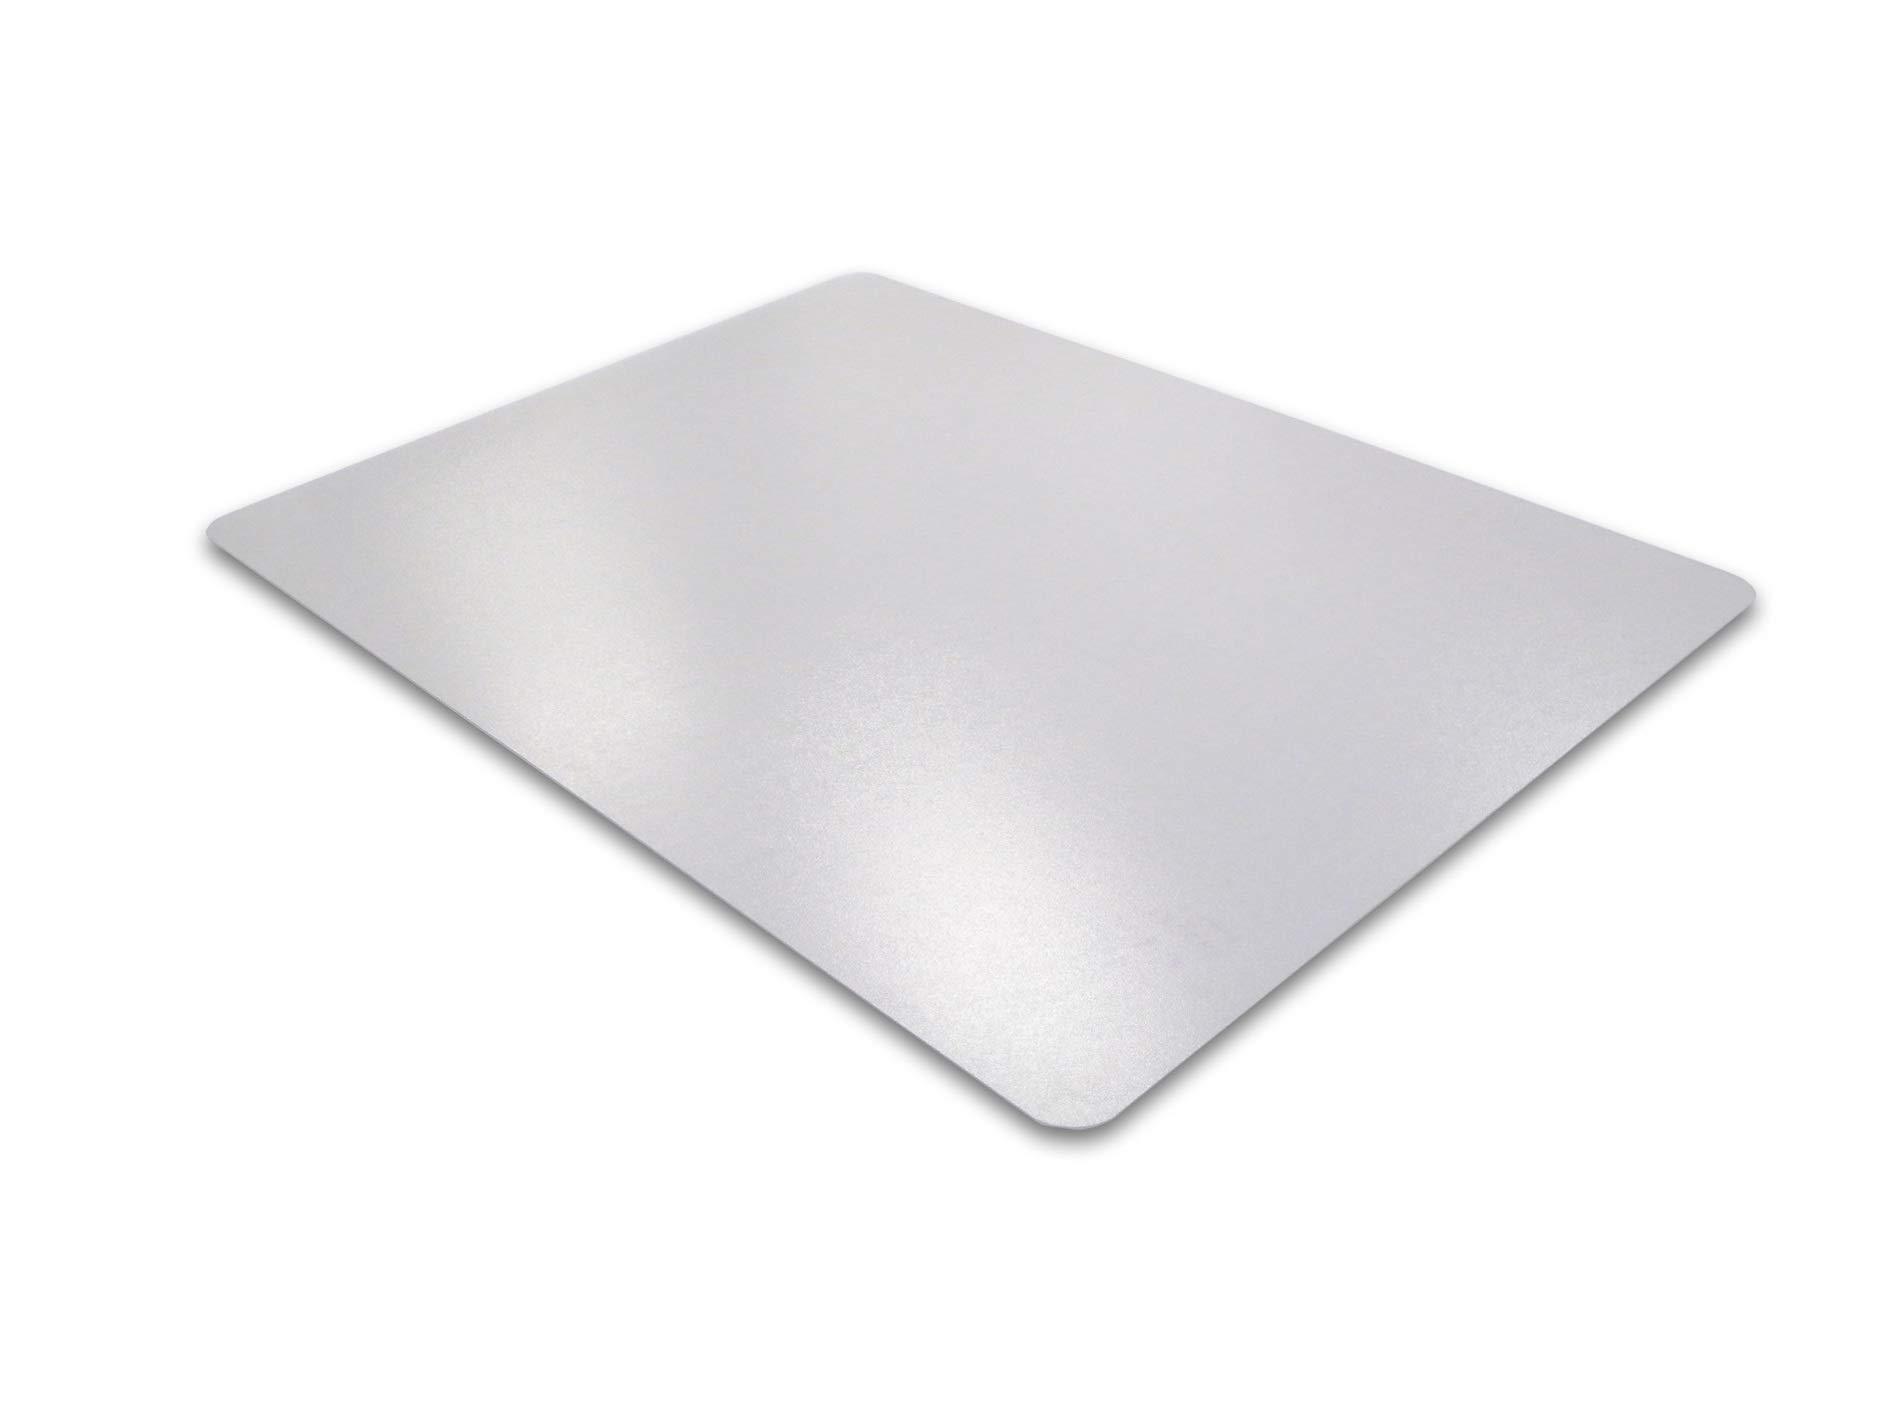 Floortex Advantage mat PVC Chair Mat for Hard Floors/Carpet Tiles, 48'' x 60'', Rectangular, Clear (FR1215020EV)